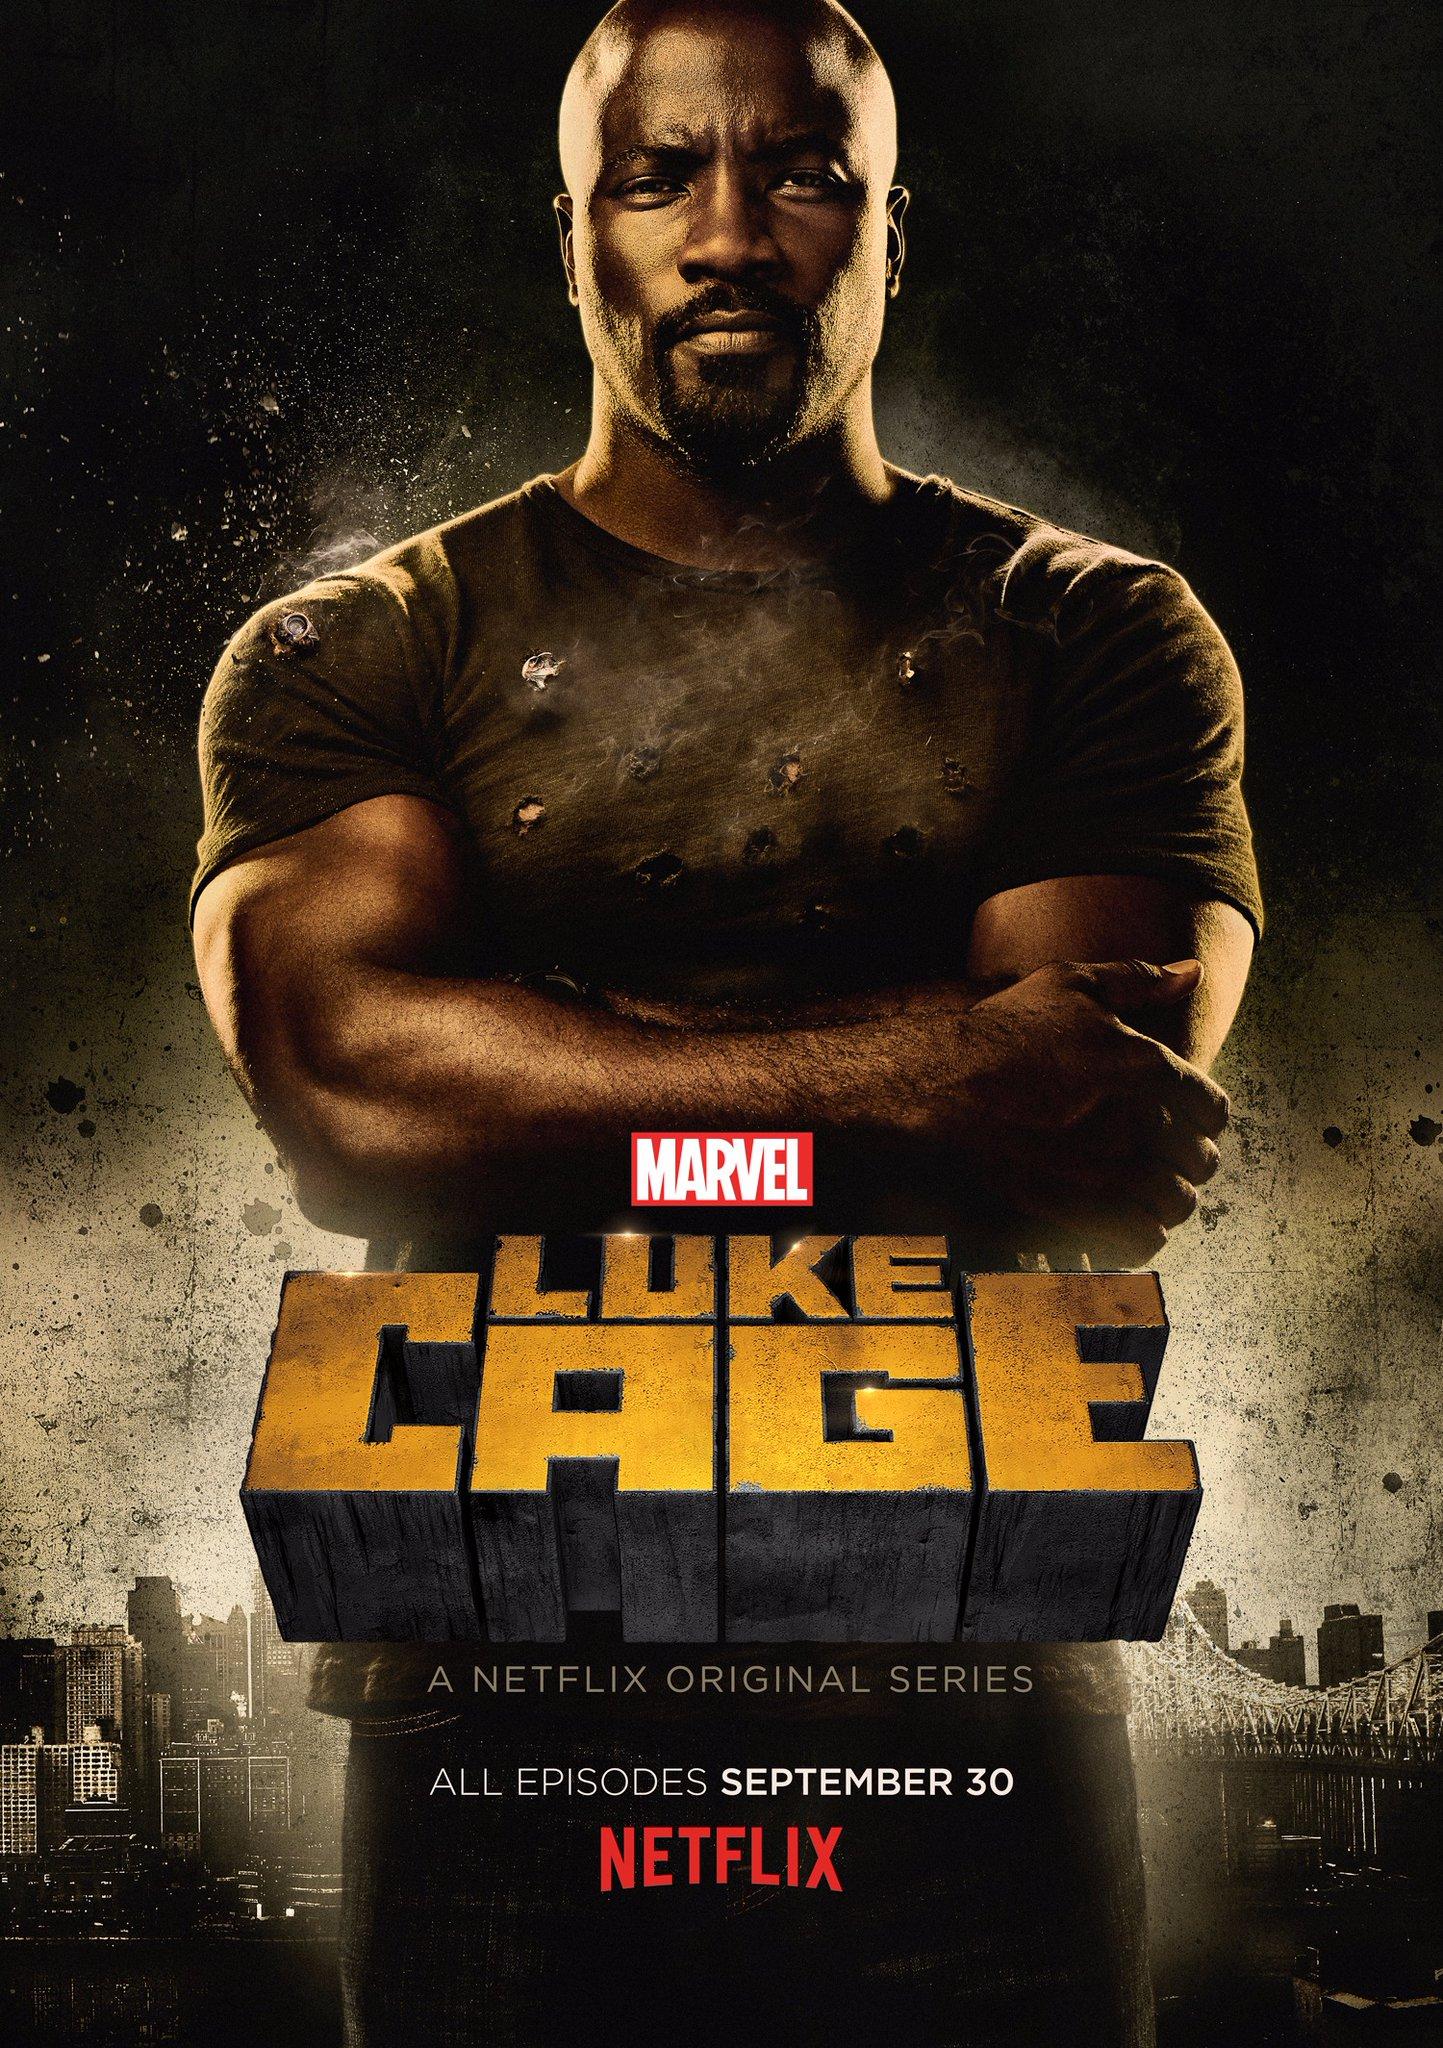 Luke Cage Netflix review: Marvel's best series yet?